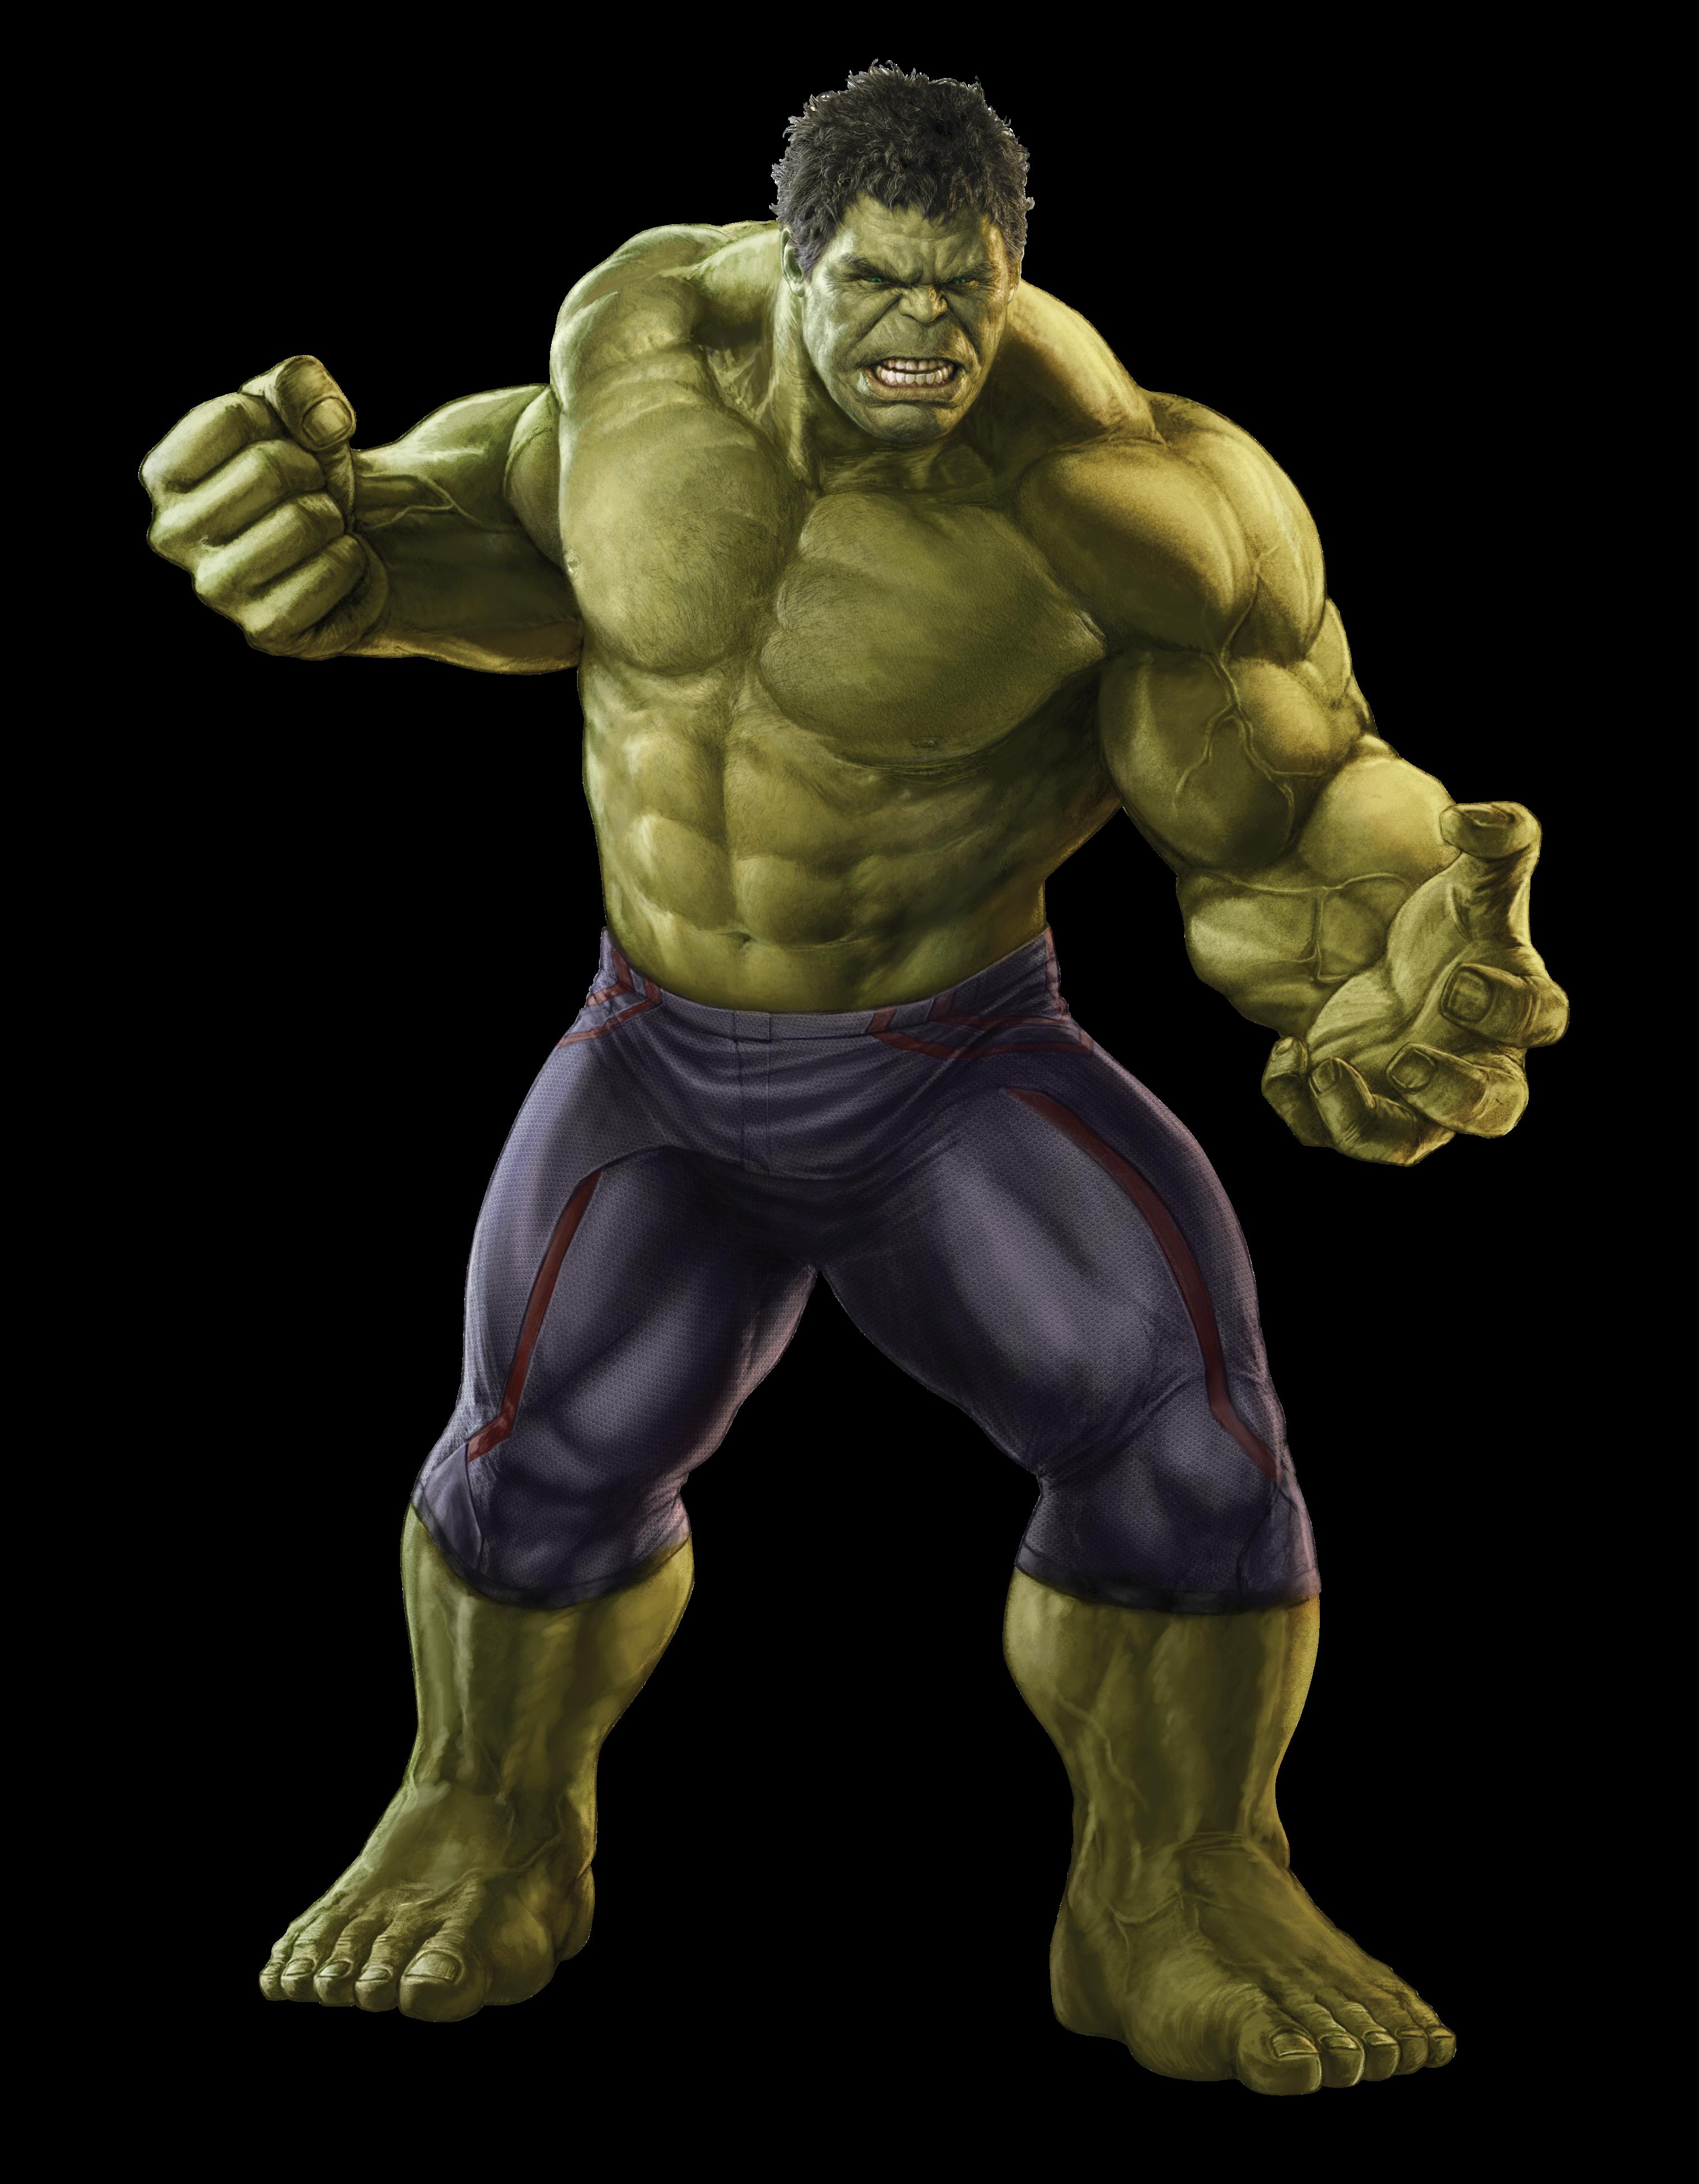 Incredible Hulk (MARVEL) - Hulk HD PNG